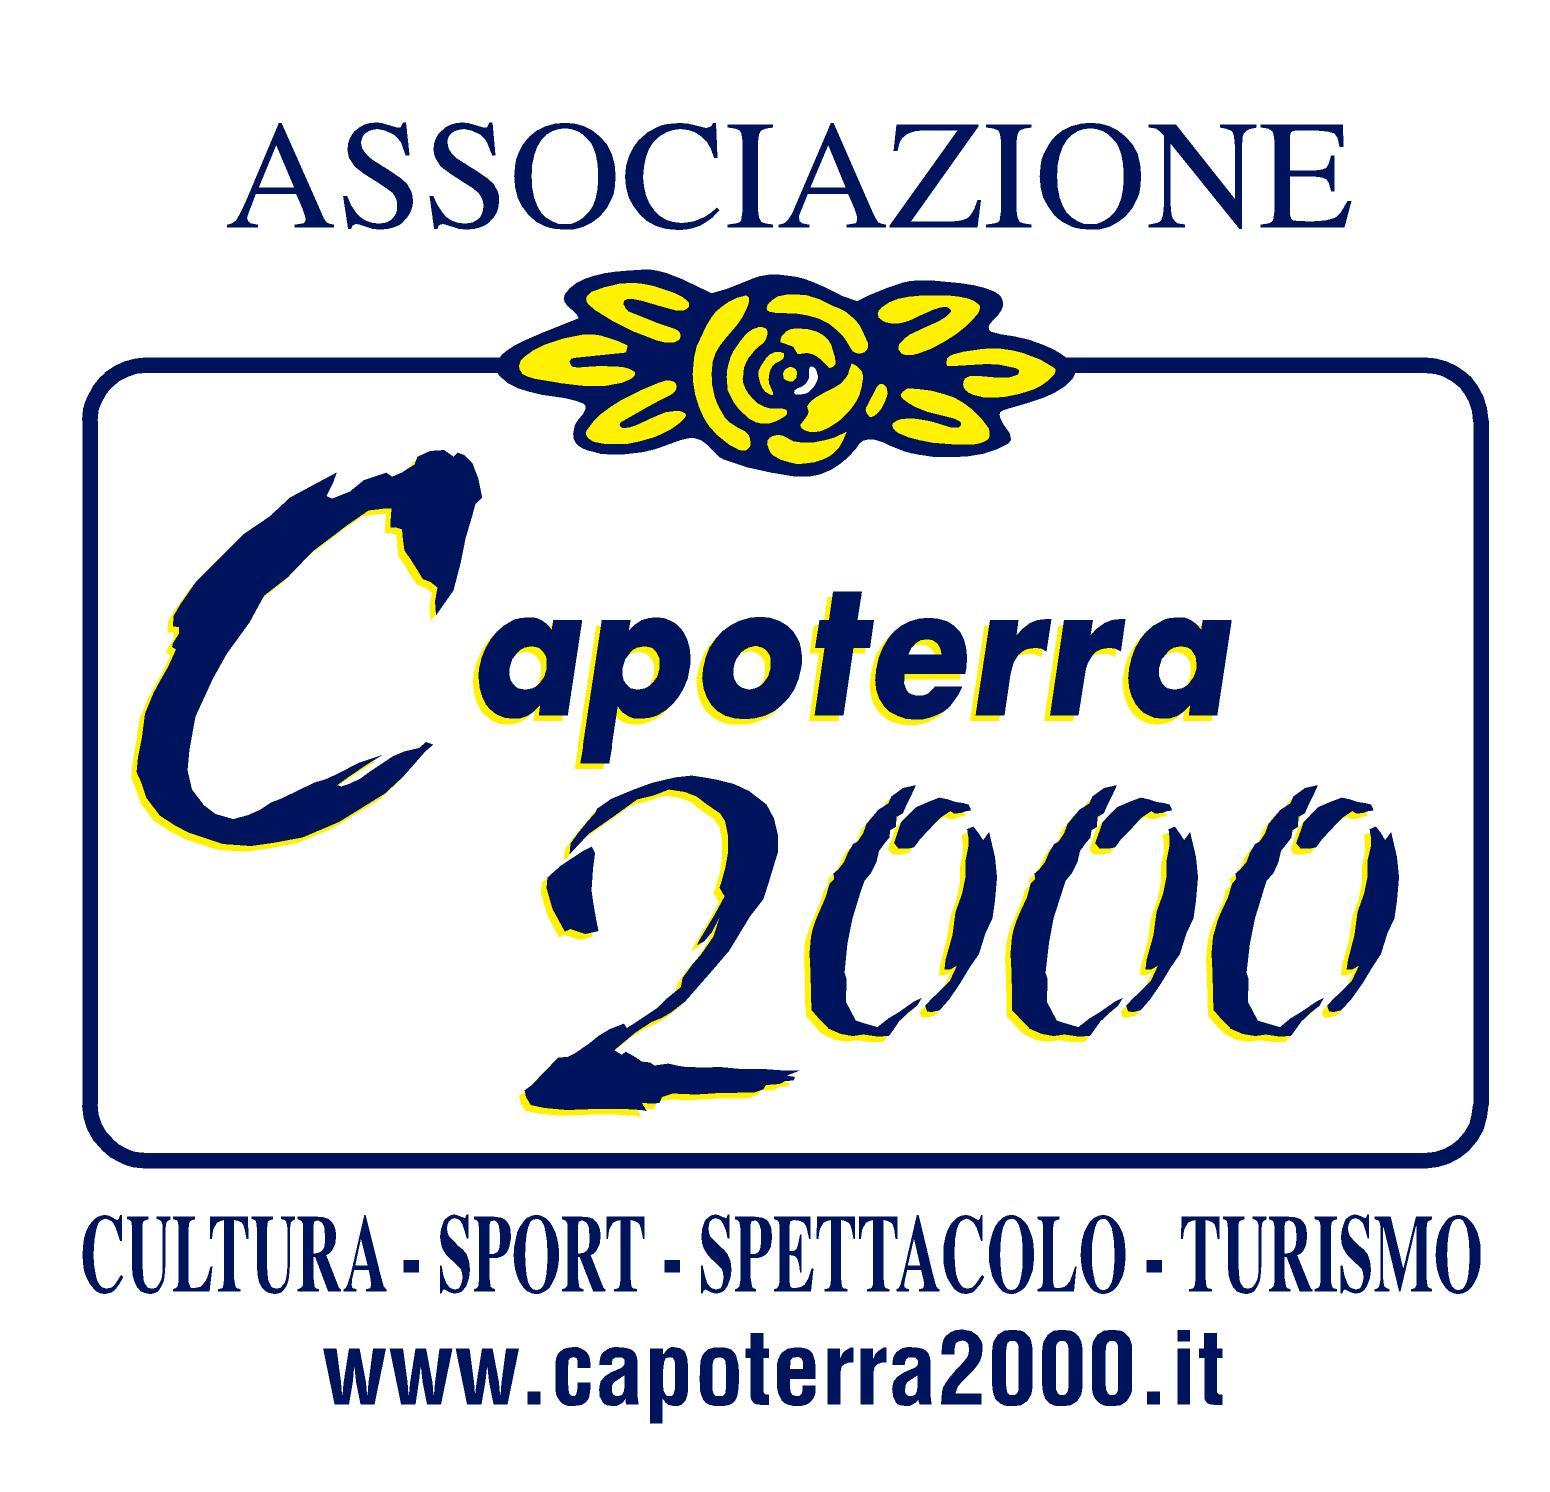 capoterra2000